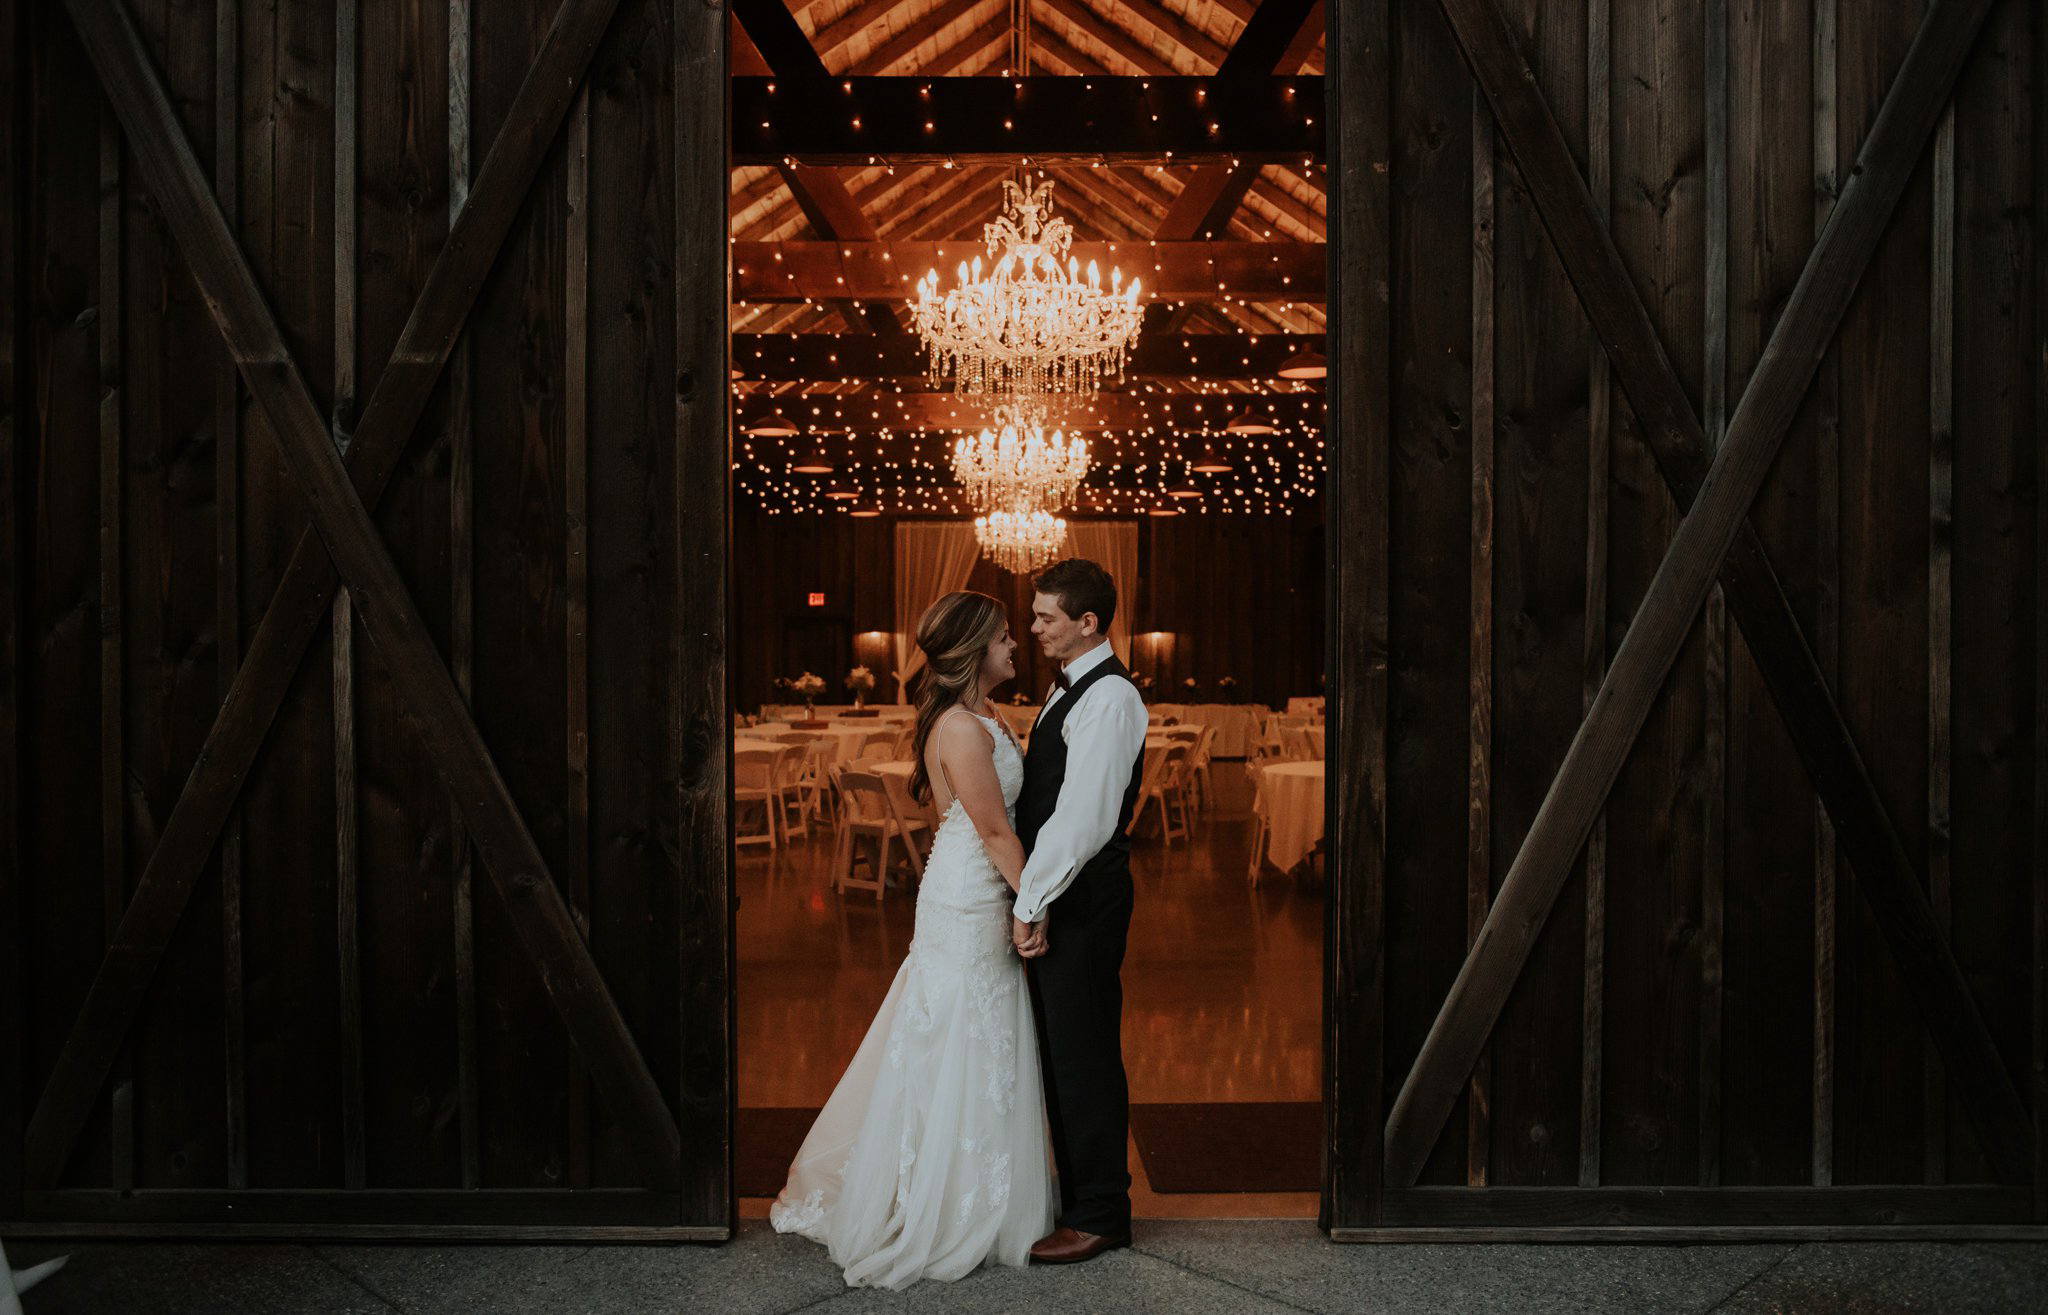 kristen-and-cody-the-kelley-farm-wedding-seattle-photographer-caitlyn-nikula-101.jpg